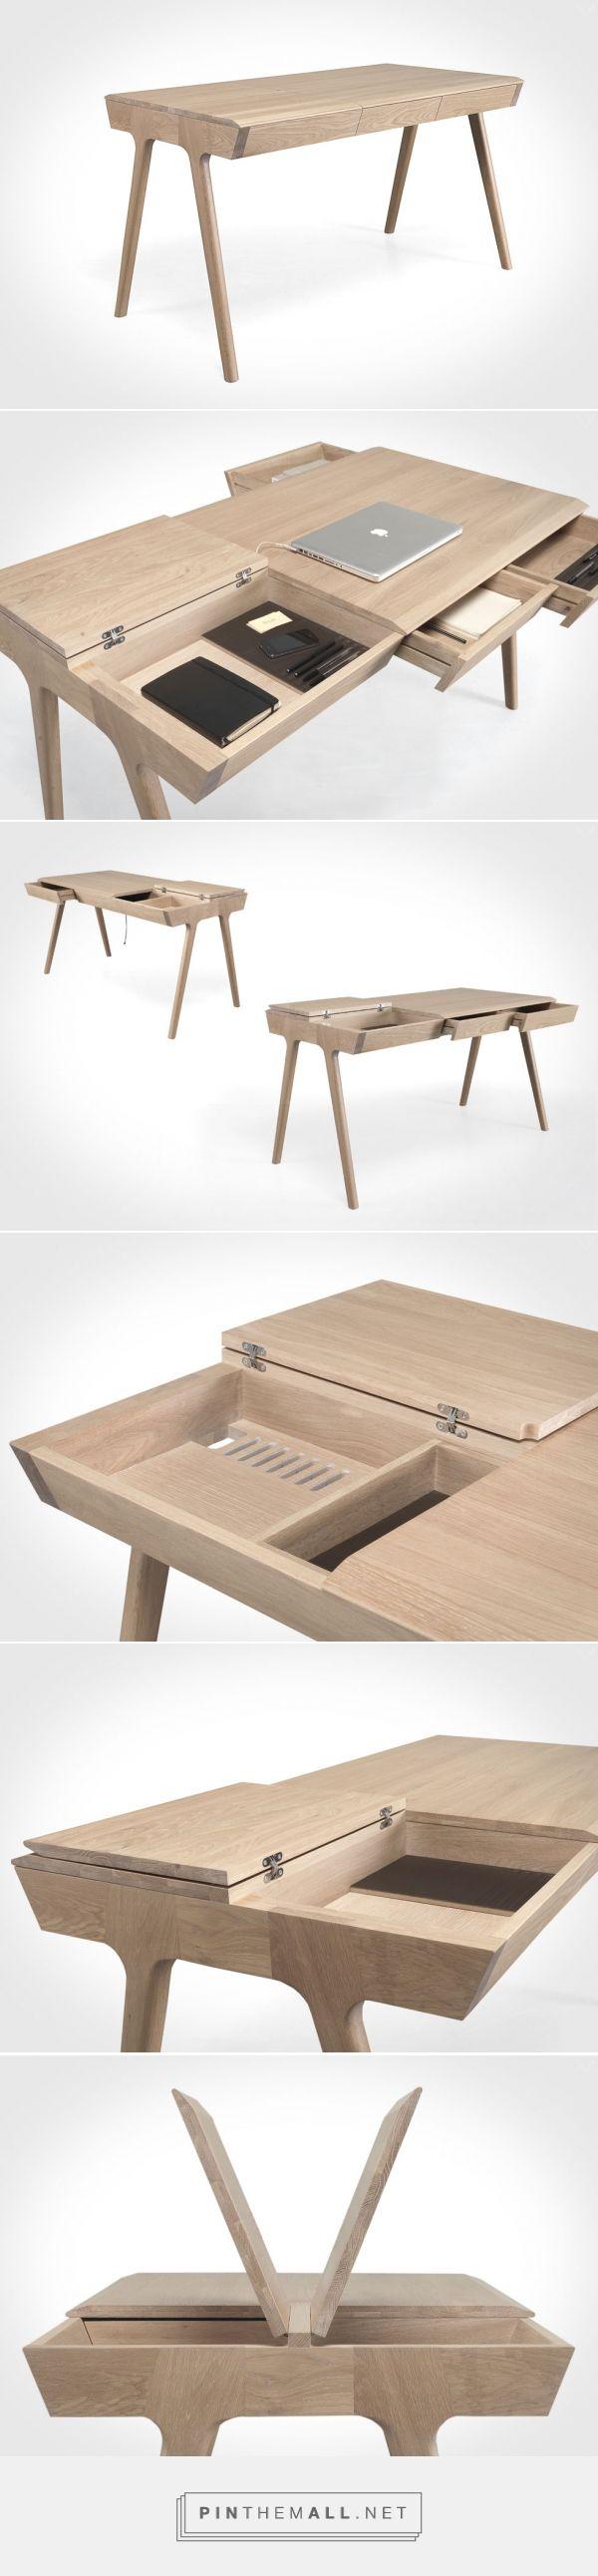 Metis Desk | LumberJac - created via https://pinthemall.net